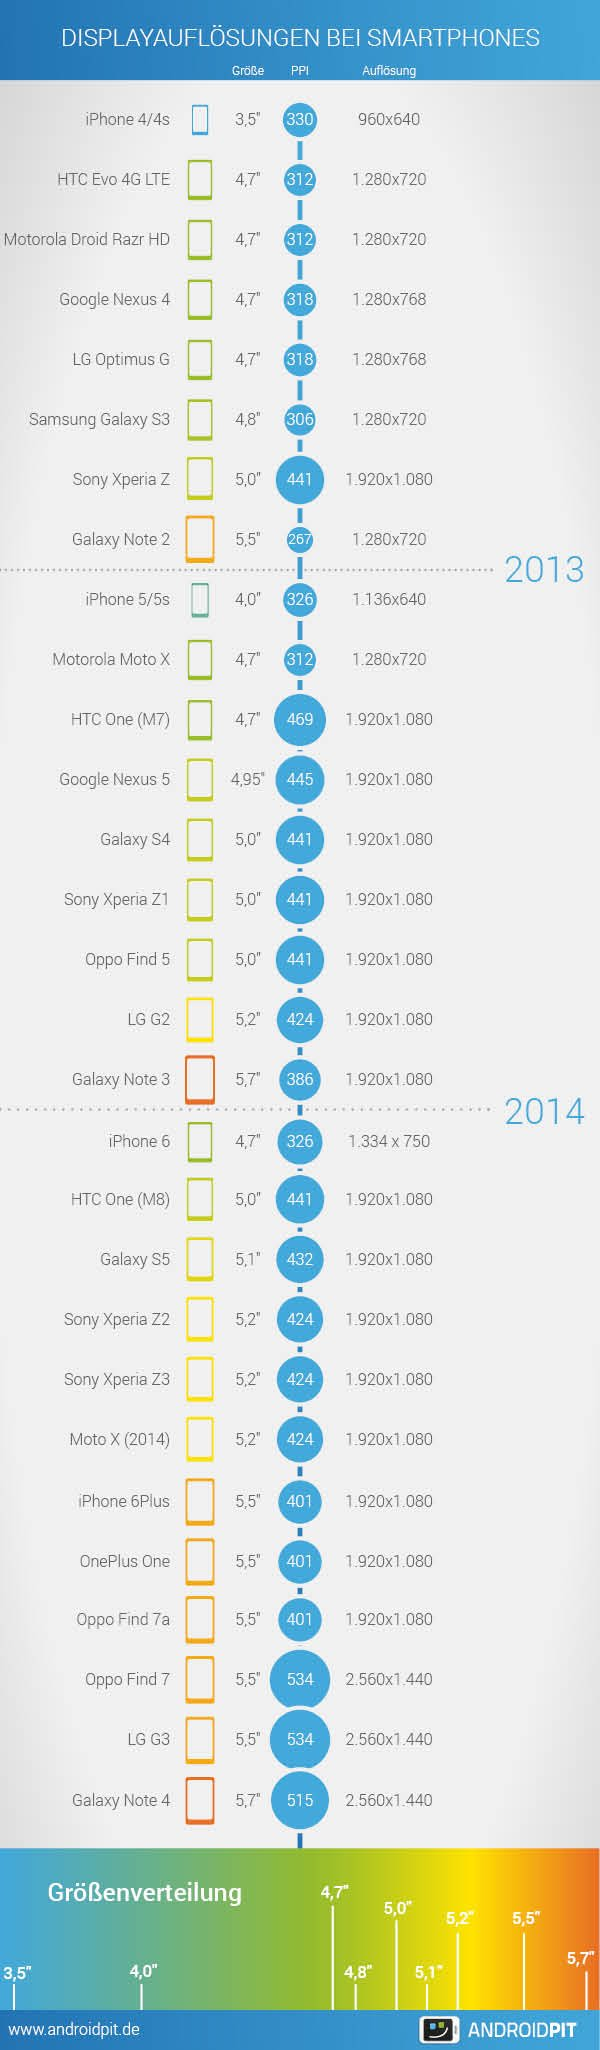 smartphone displays groesse aufloesung infografik